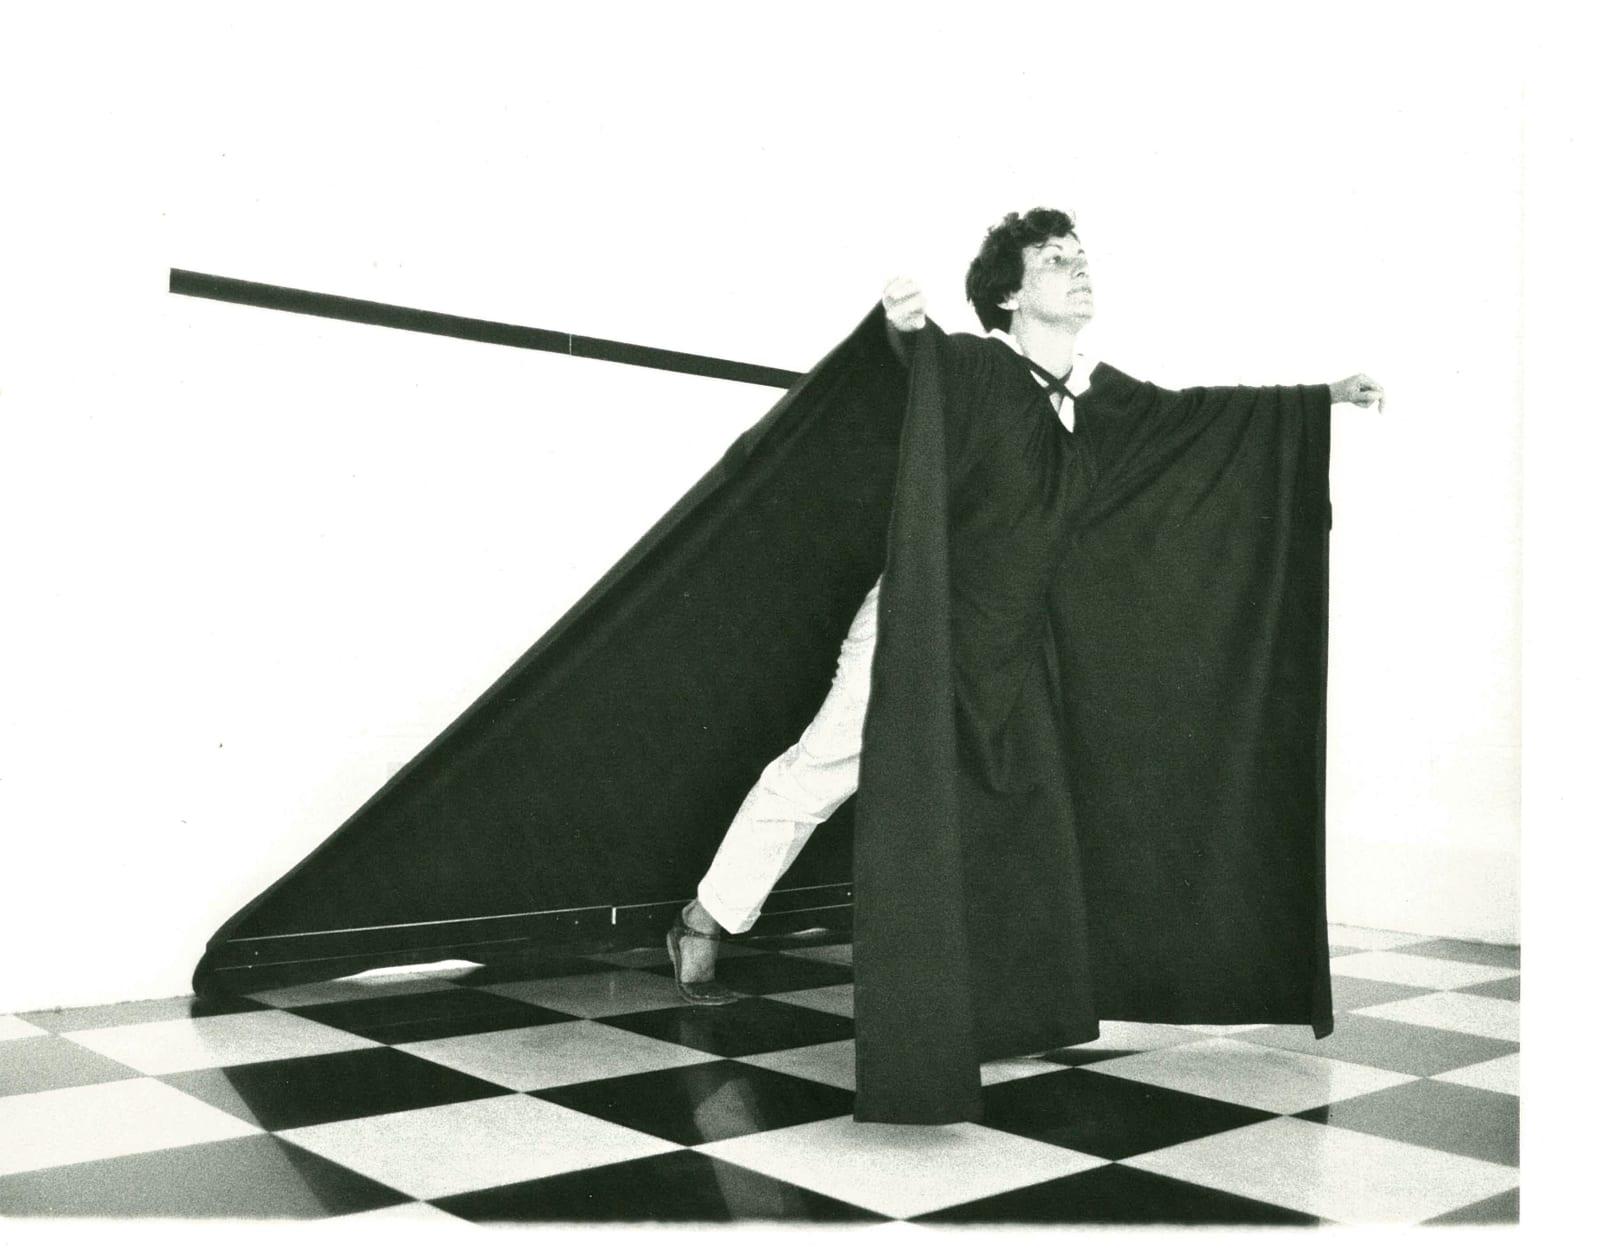 Martha Araújo, Hábito/Habitante, 1985